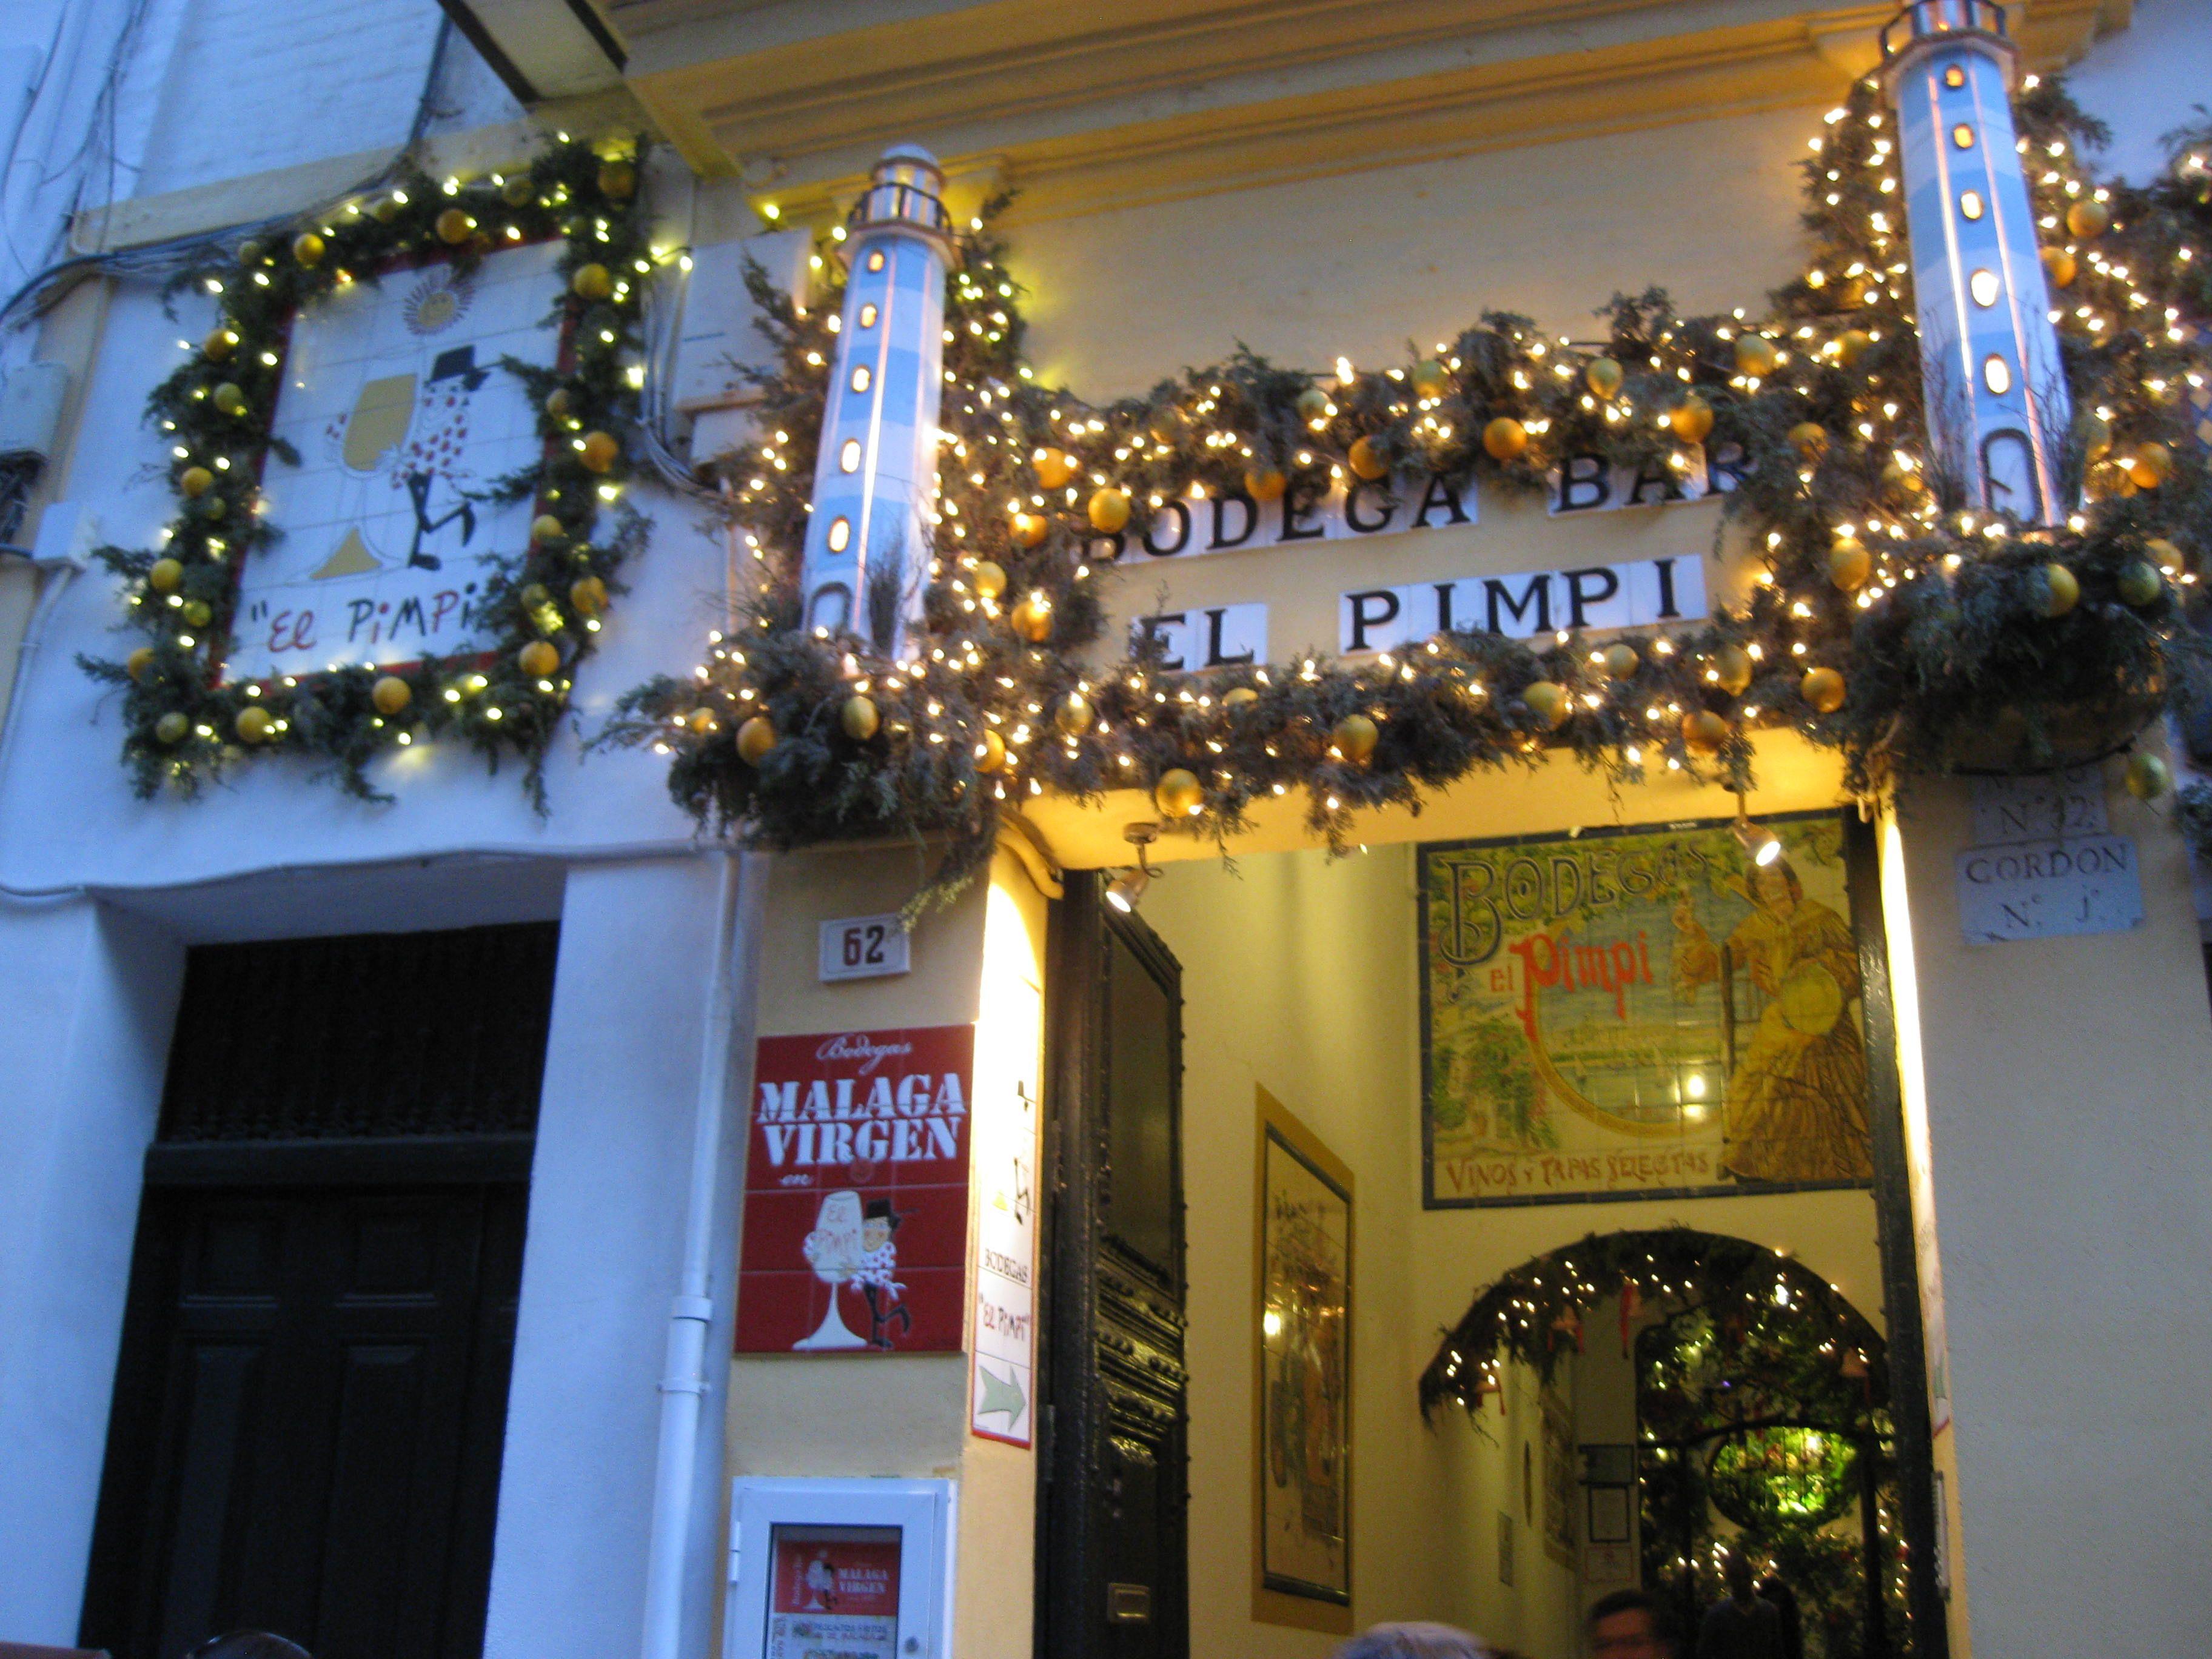 The Famous Bodega Bar El Pimpi In Malaga Centre Granada Street